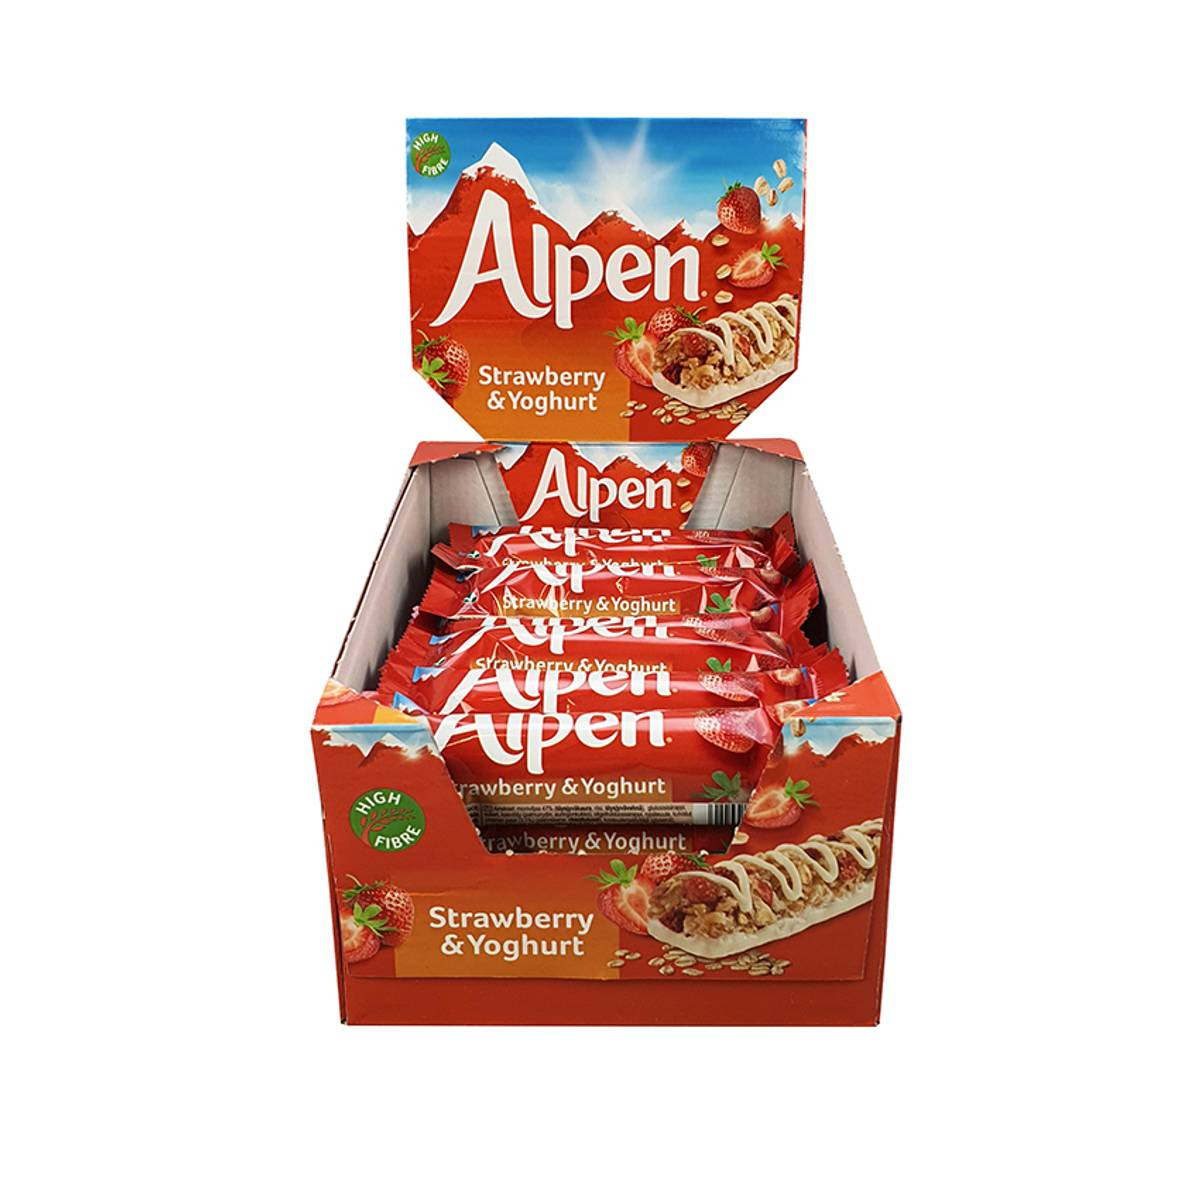 Alpen Strawberry & Yoghurt (Kartong 24stk)